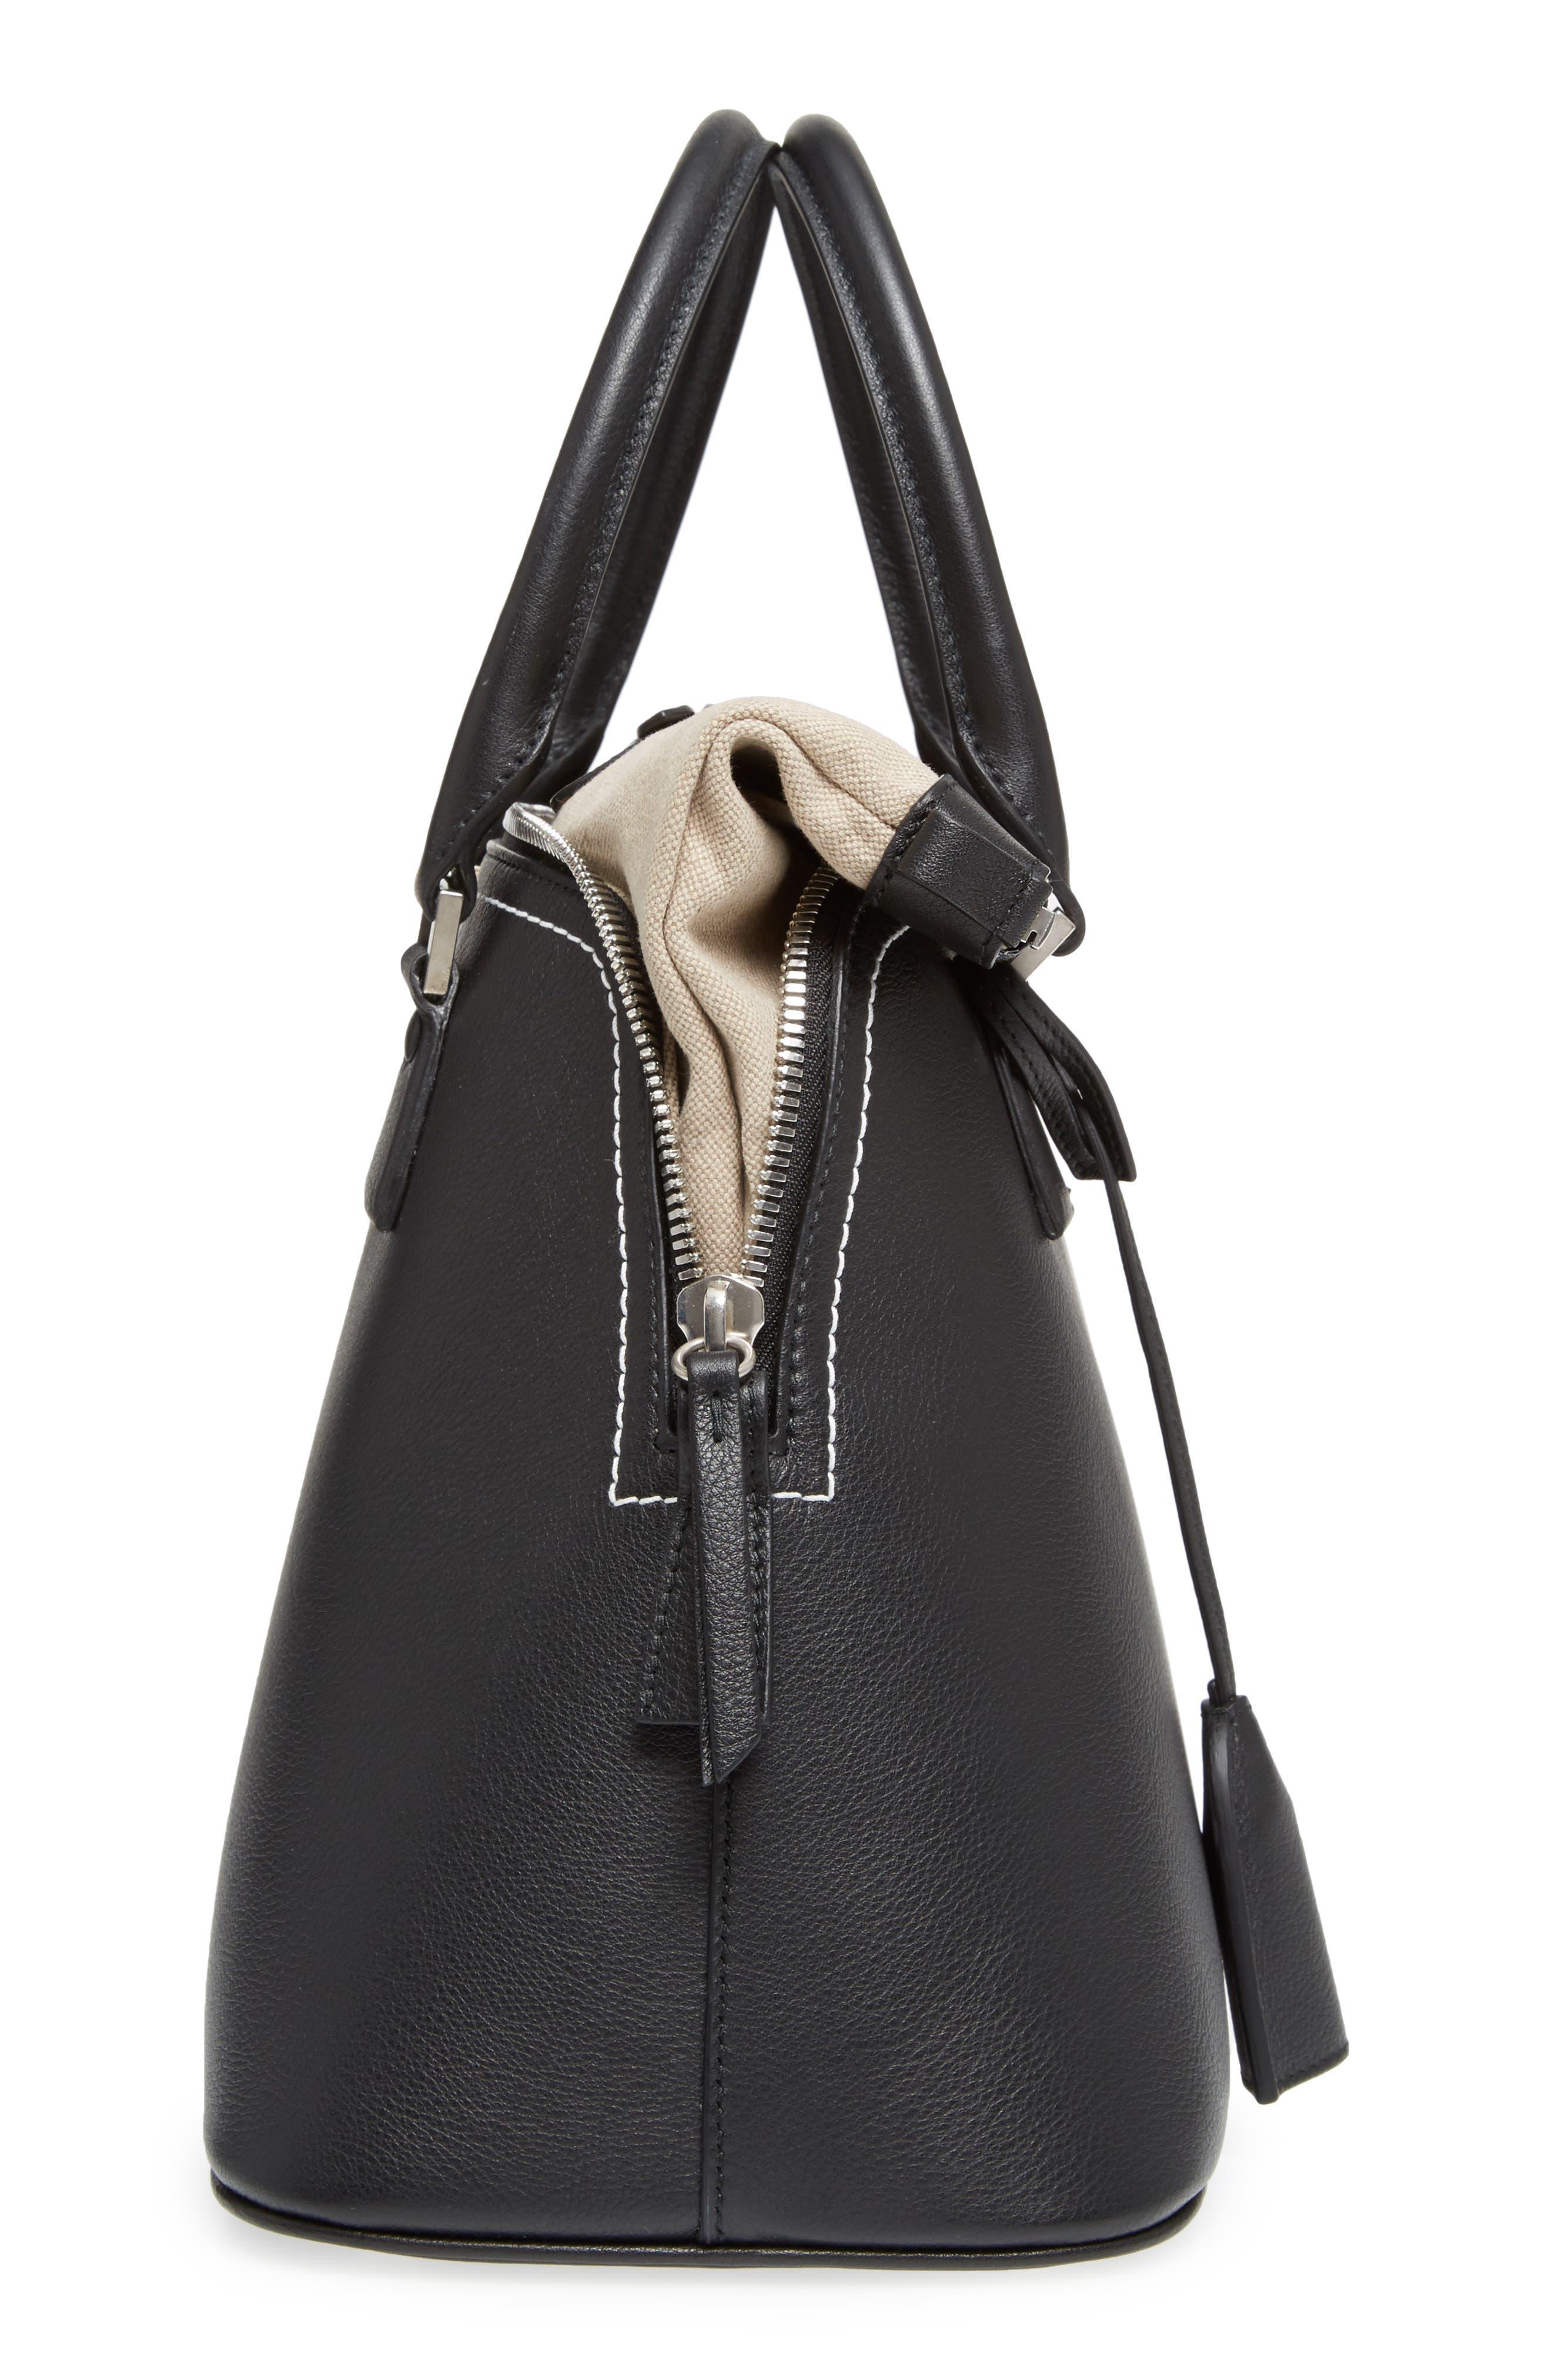 Medium 5AC Leather Handbag,                             Alternate thumbnail 5, color,                             001